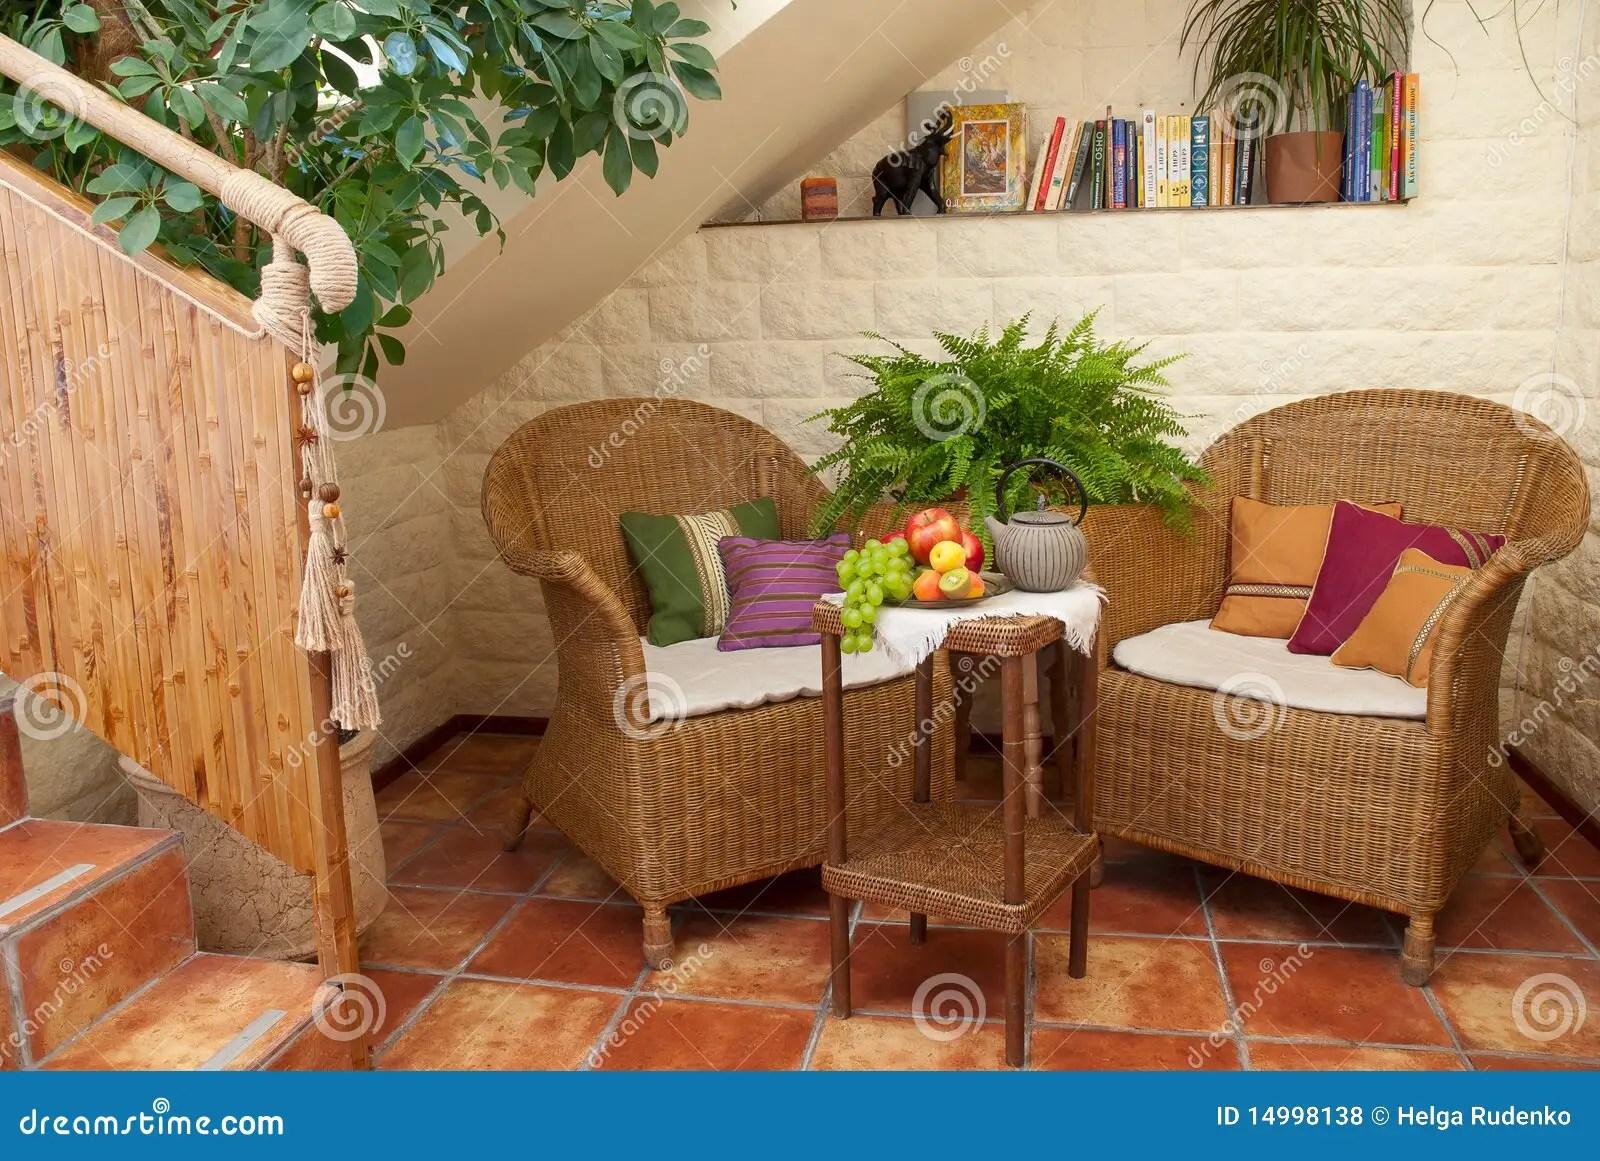 Artistic Garden Furniture On Patio Royalty Free Stock